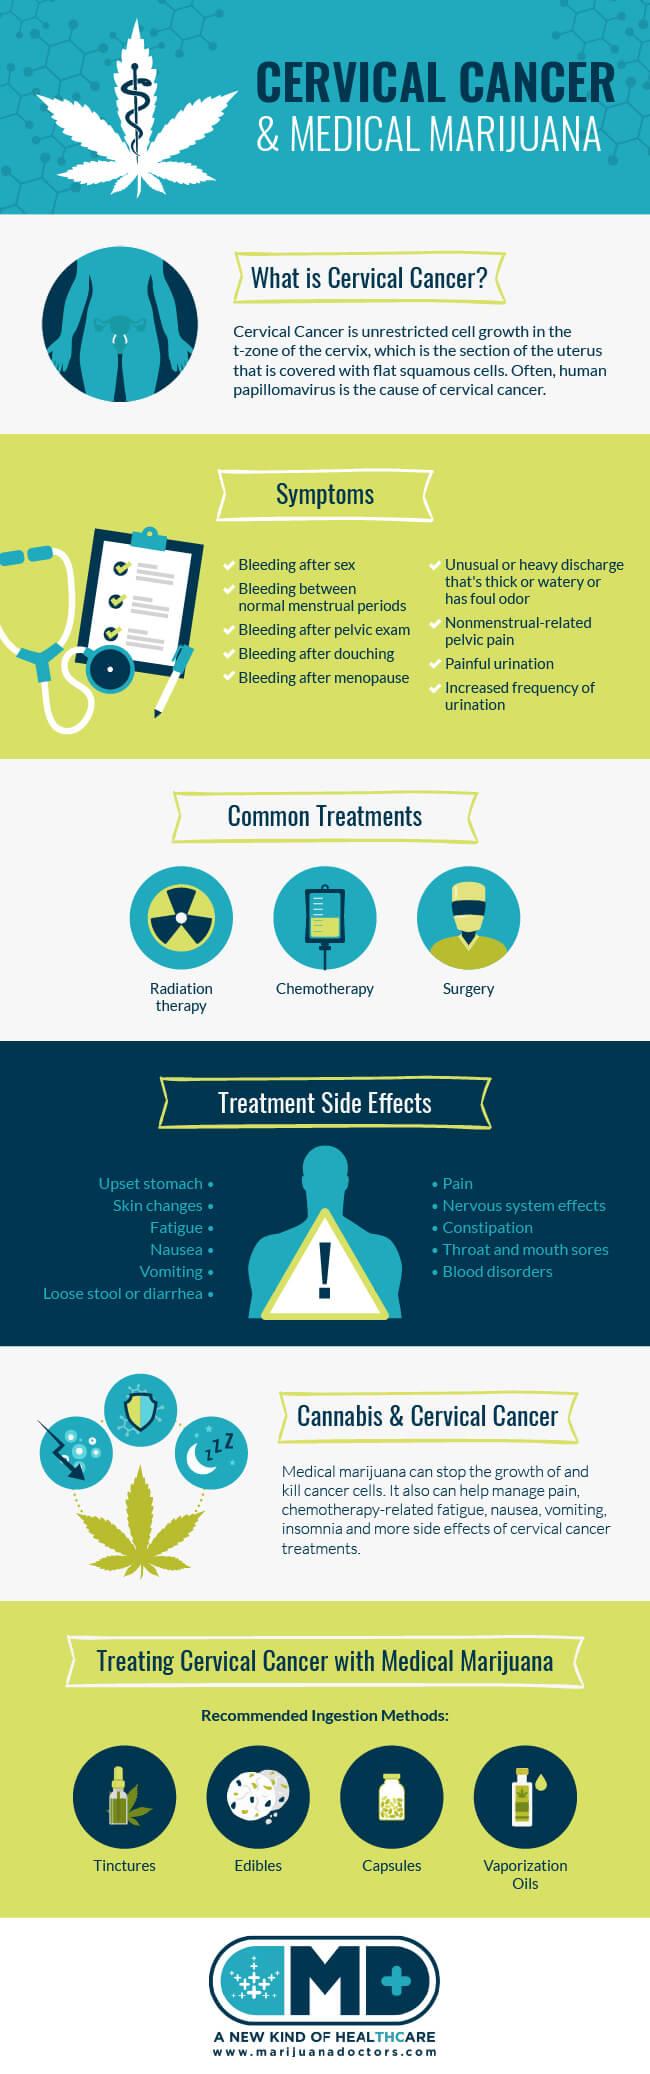 Medical Marijuana and Cervical Cancer